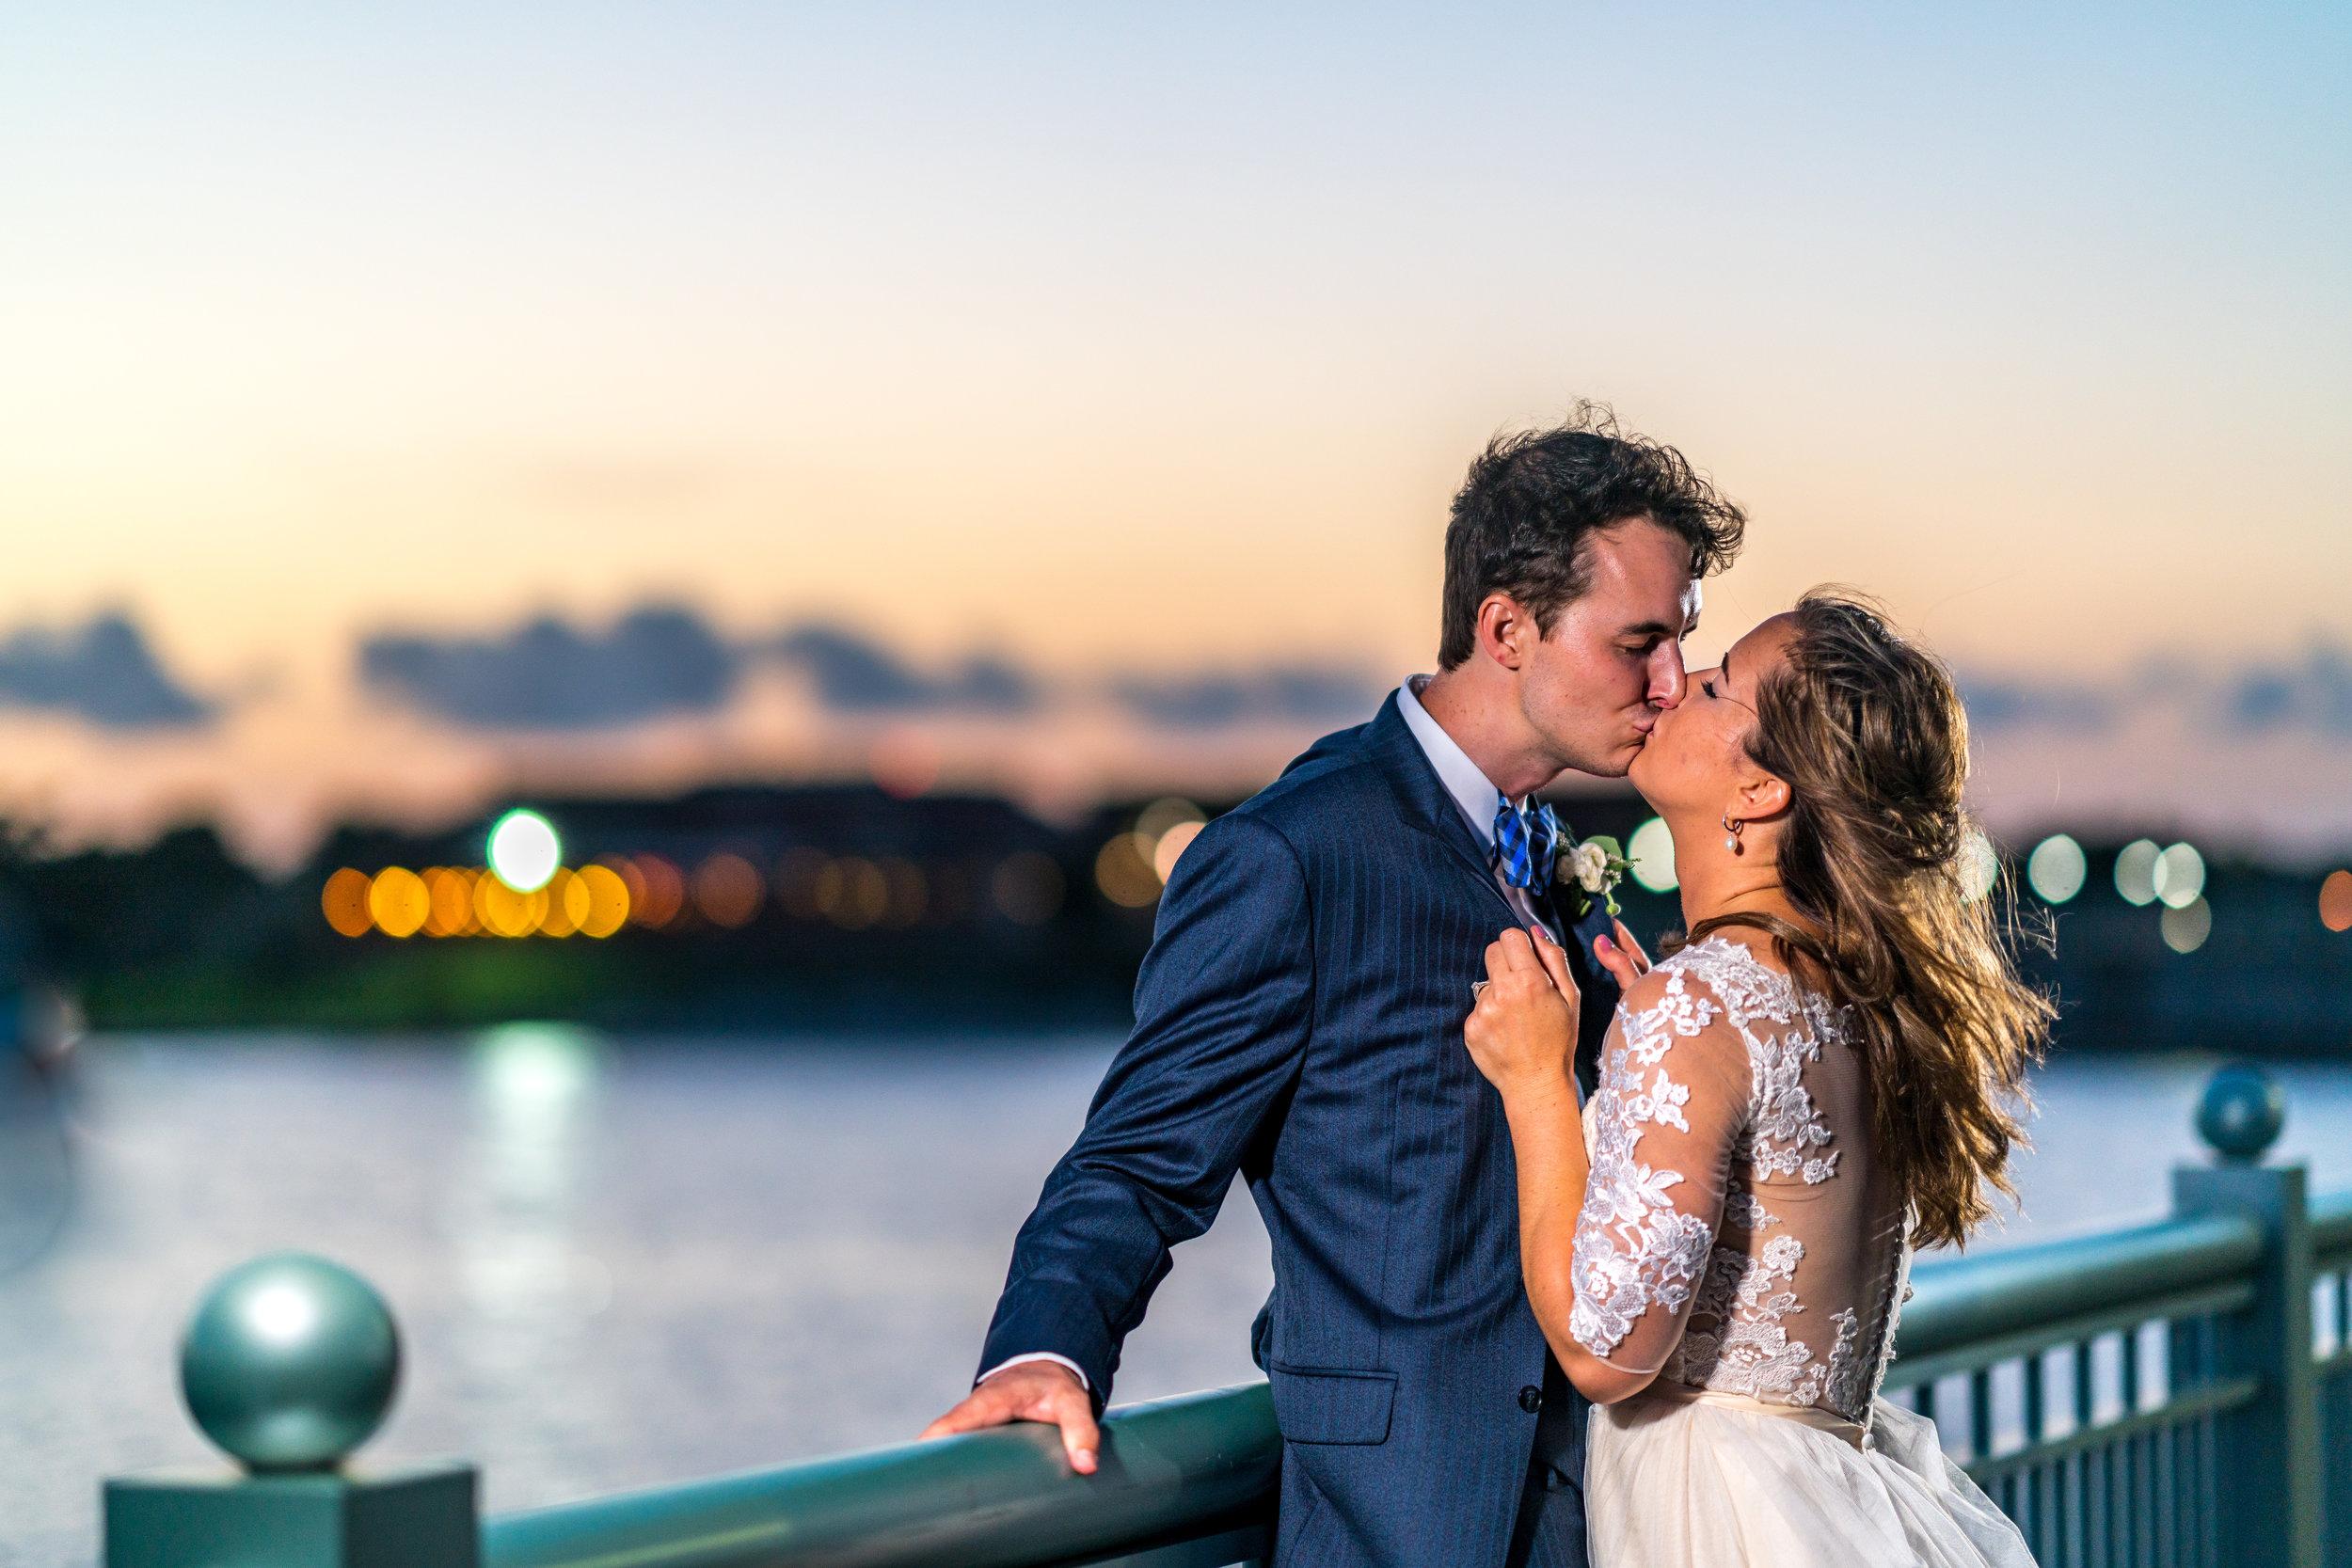 bride-groom-downtown-photo-ideas.jpg